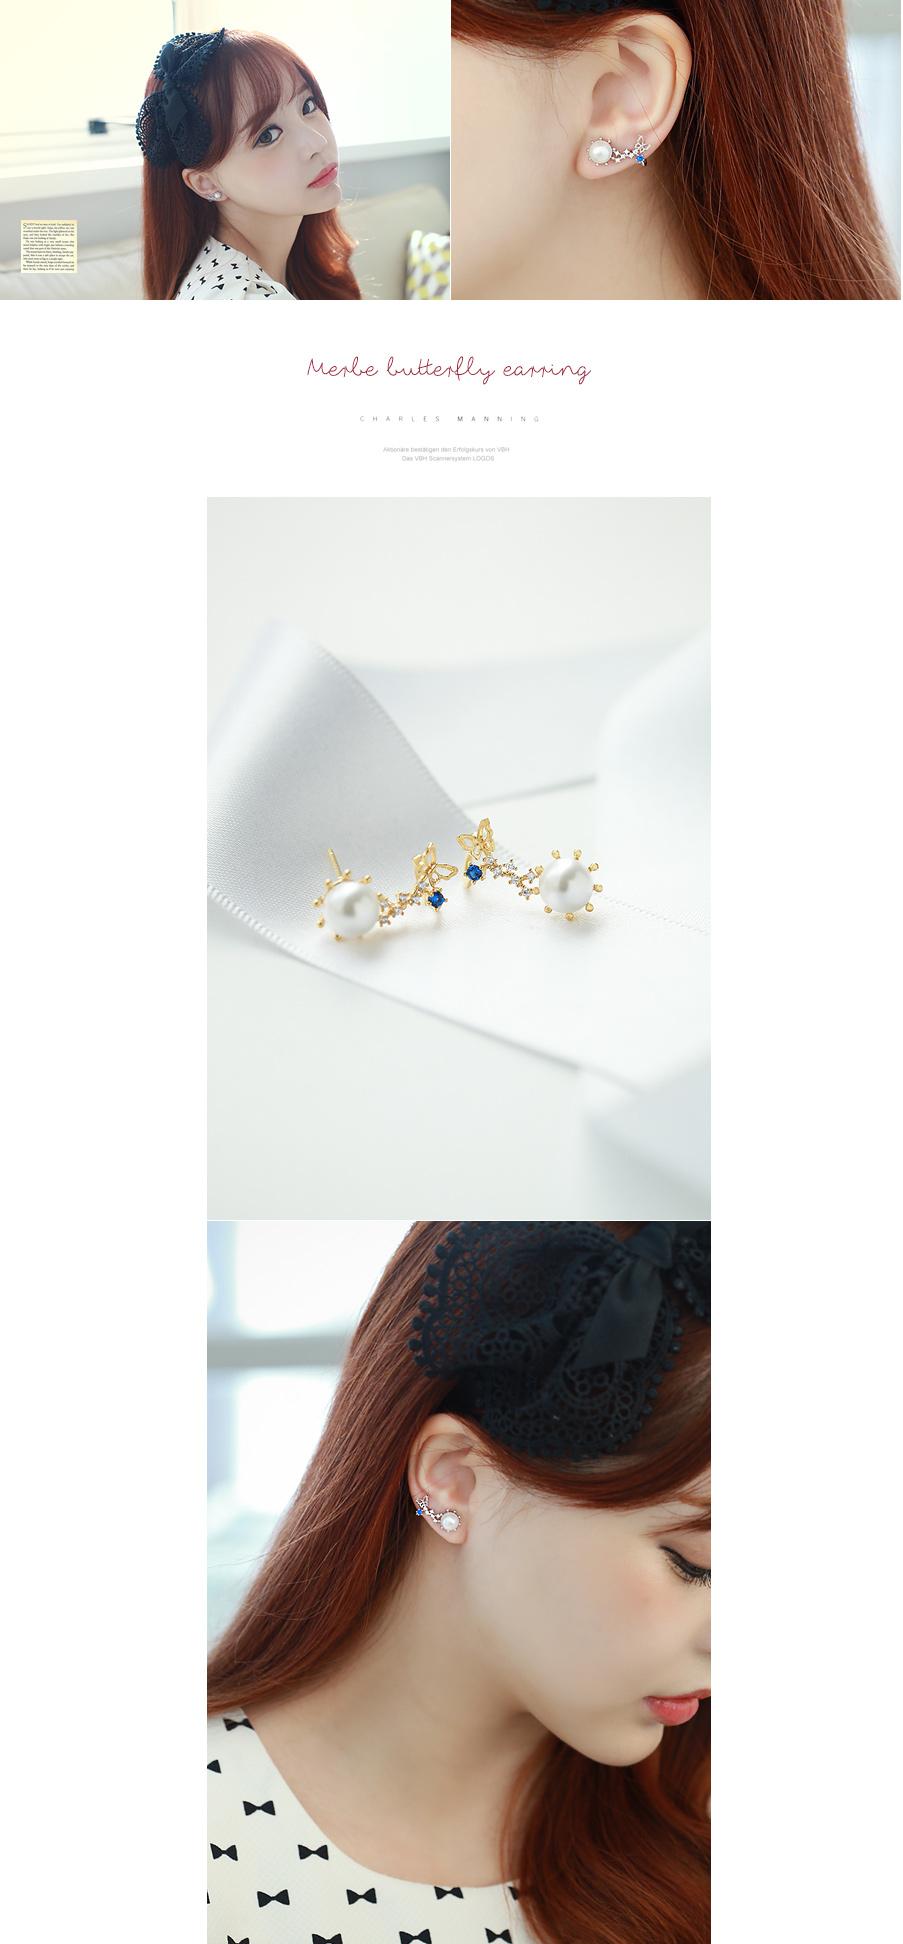 [ 4xtyle ] [银] MERBE 蝴蝶耳环(WHITEGOLD)